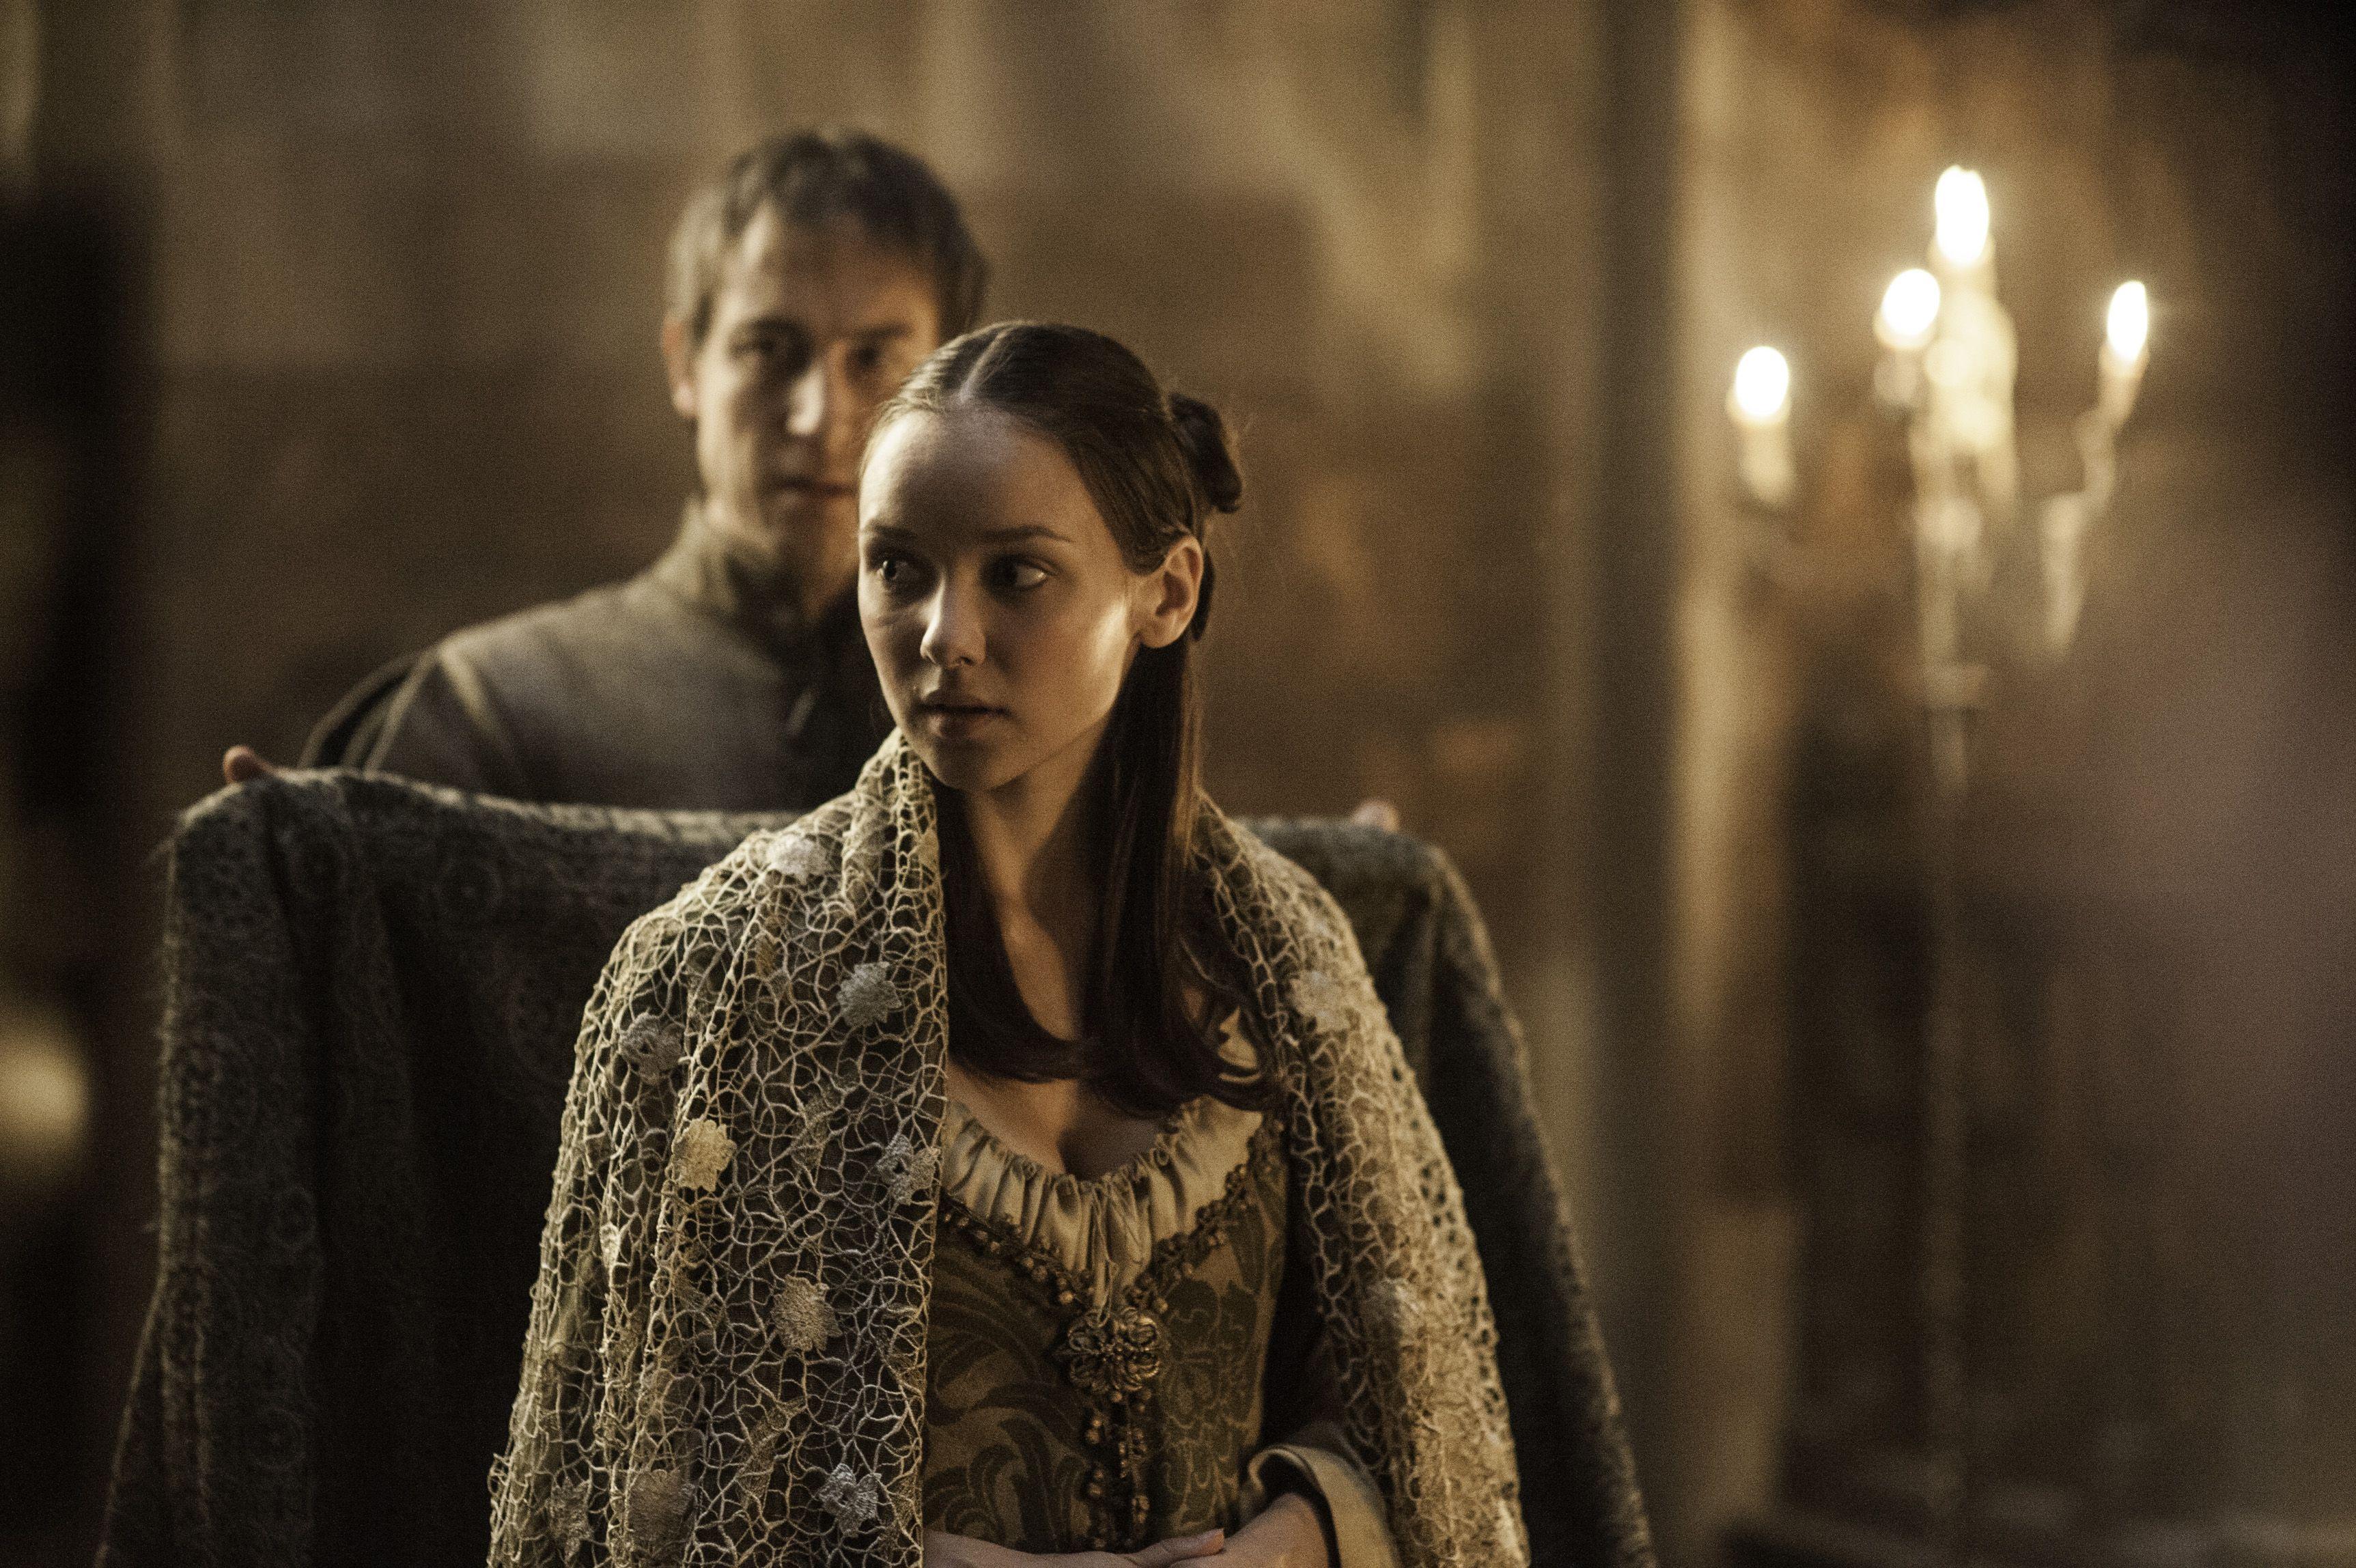 Game Of Thrones Season 3 Episode 9 Still Game Of Thrones Red Wedding Game Of Thrones Costumes